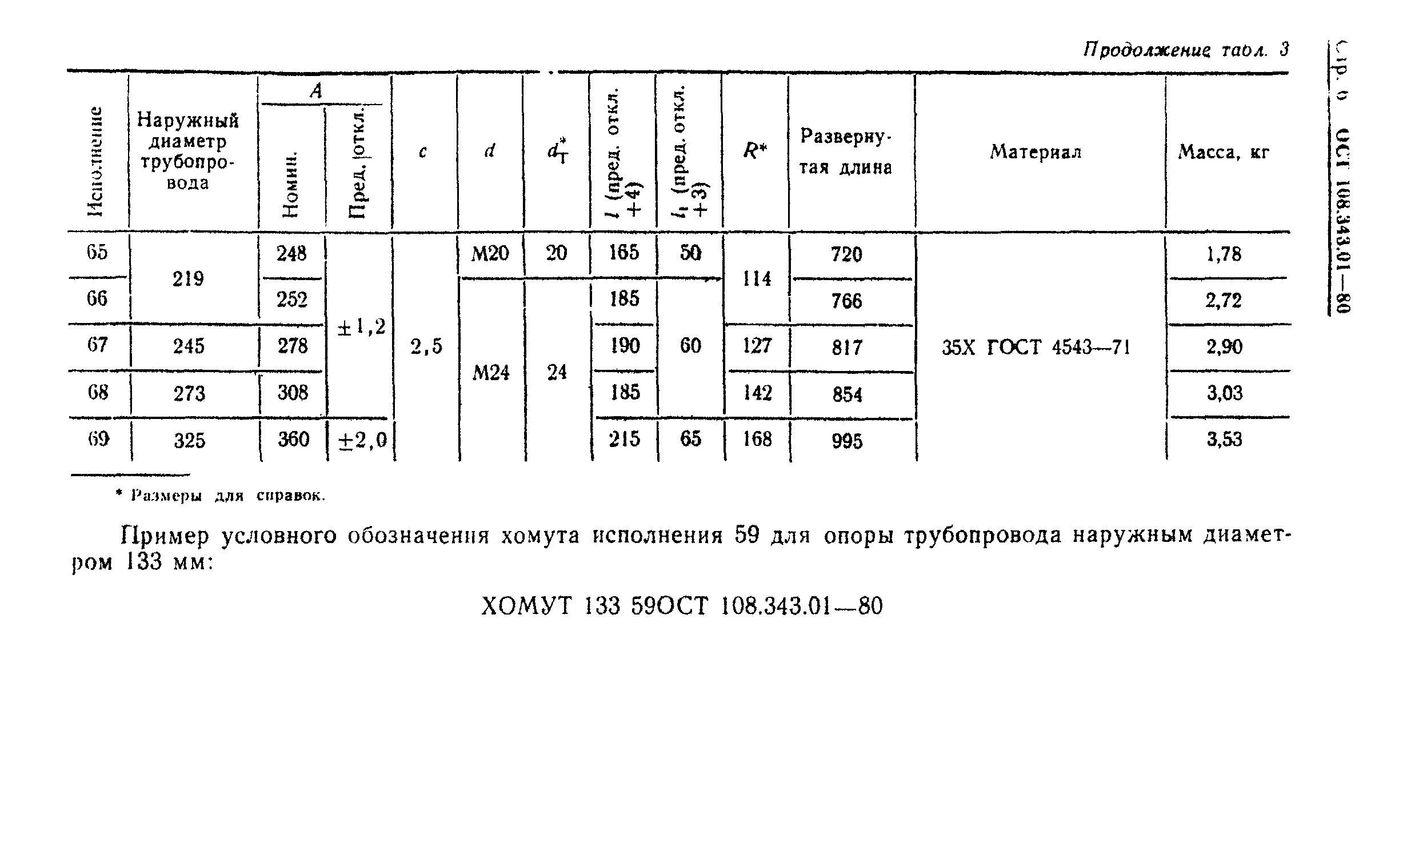 Хомуты ОСТ 108.343.01-80 стр.6